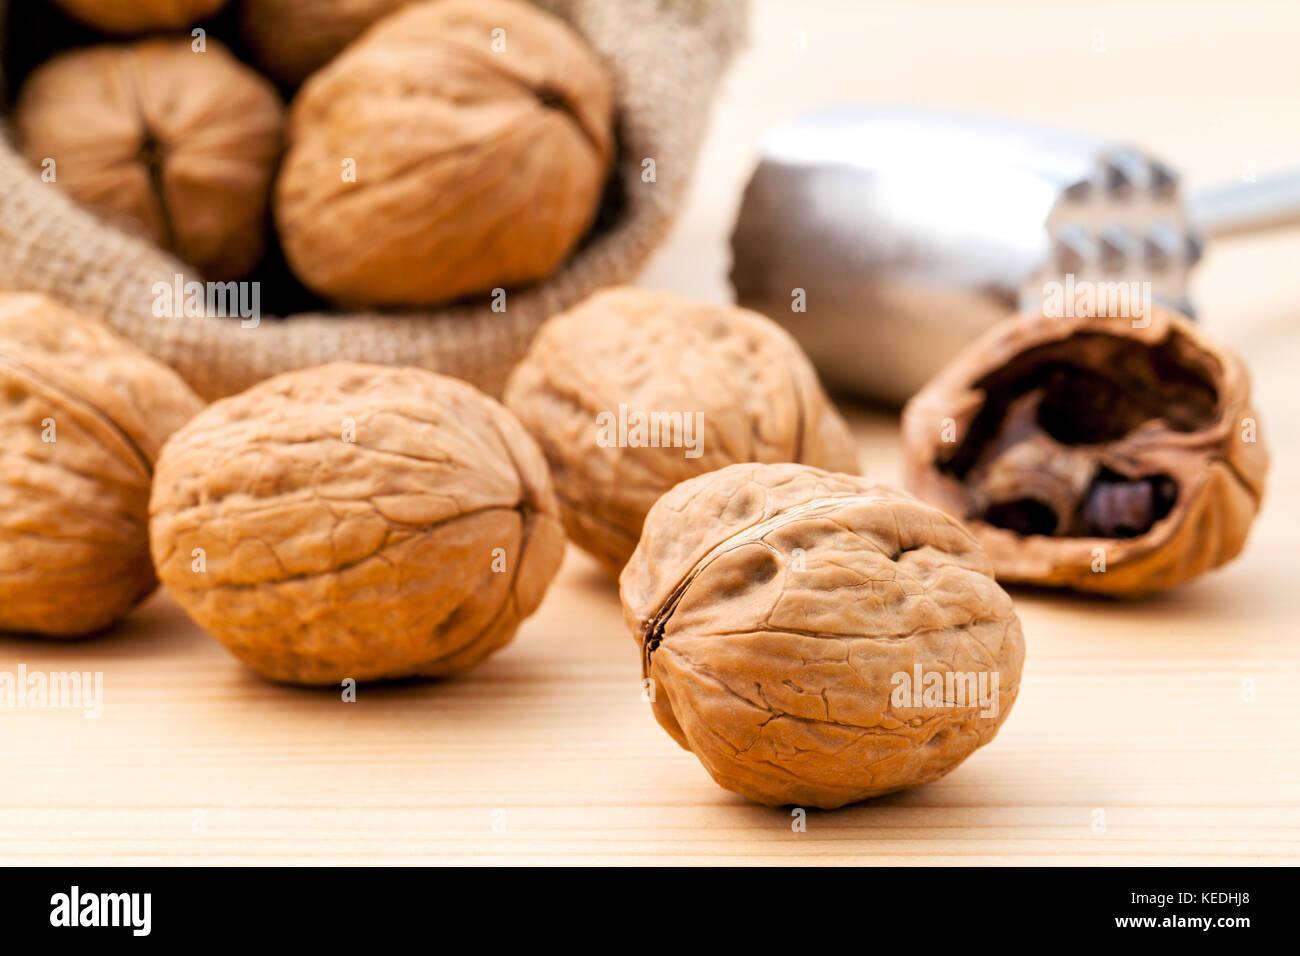 Walnuts kernels and whole walnuts on wooden background. Whole and chopped walnuts on wooden background. Walnuts - Stock Image